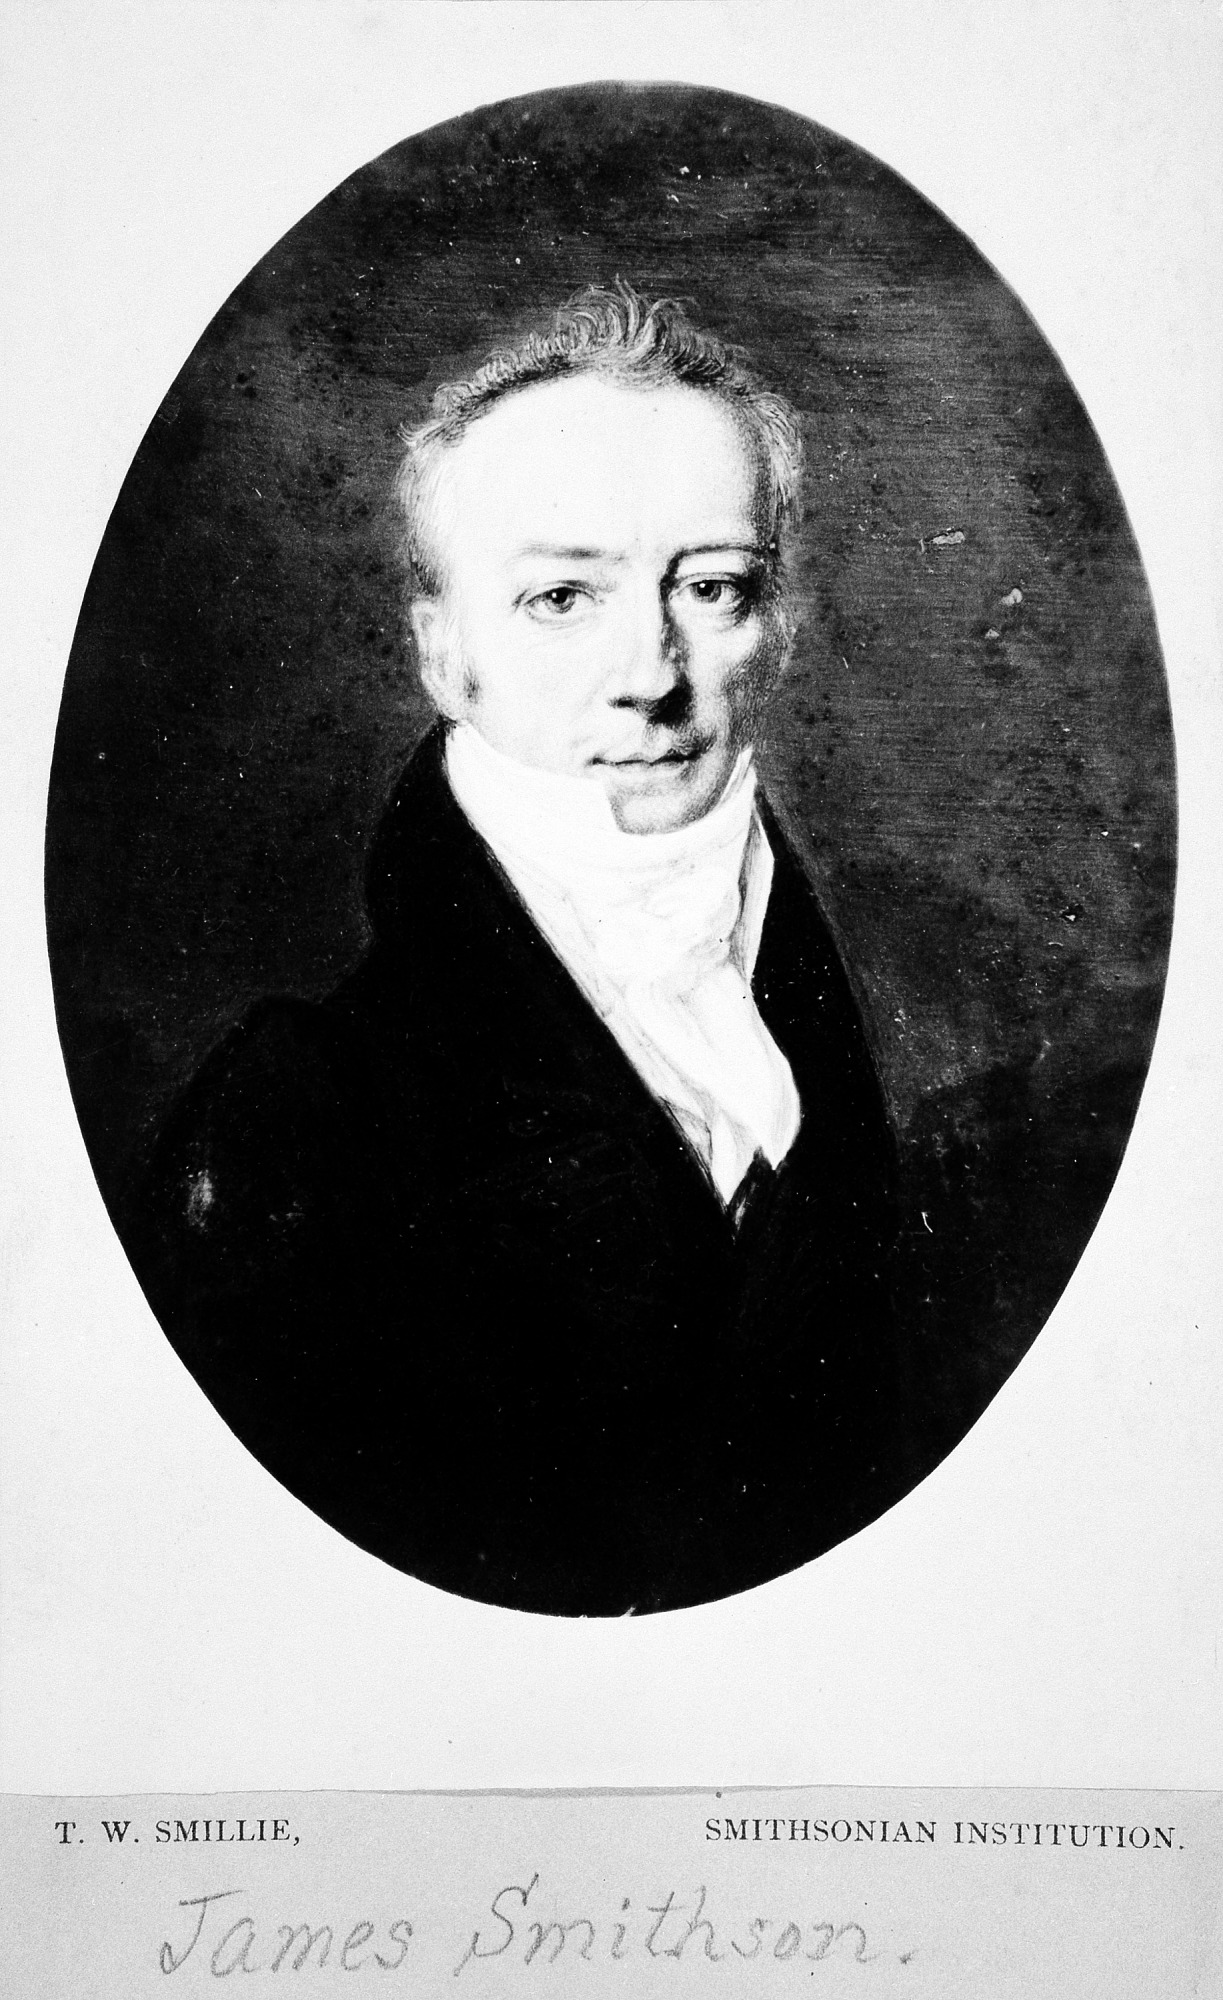 James Smithson Portrait by H. Johns